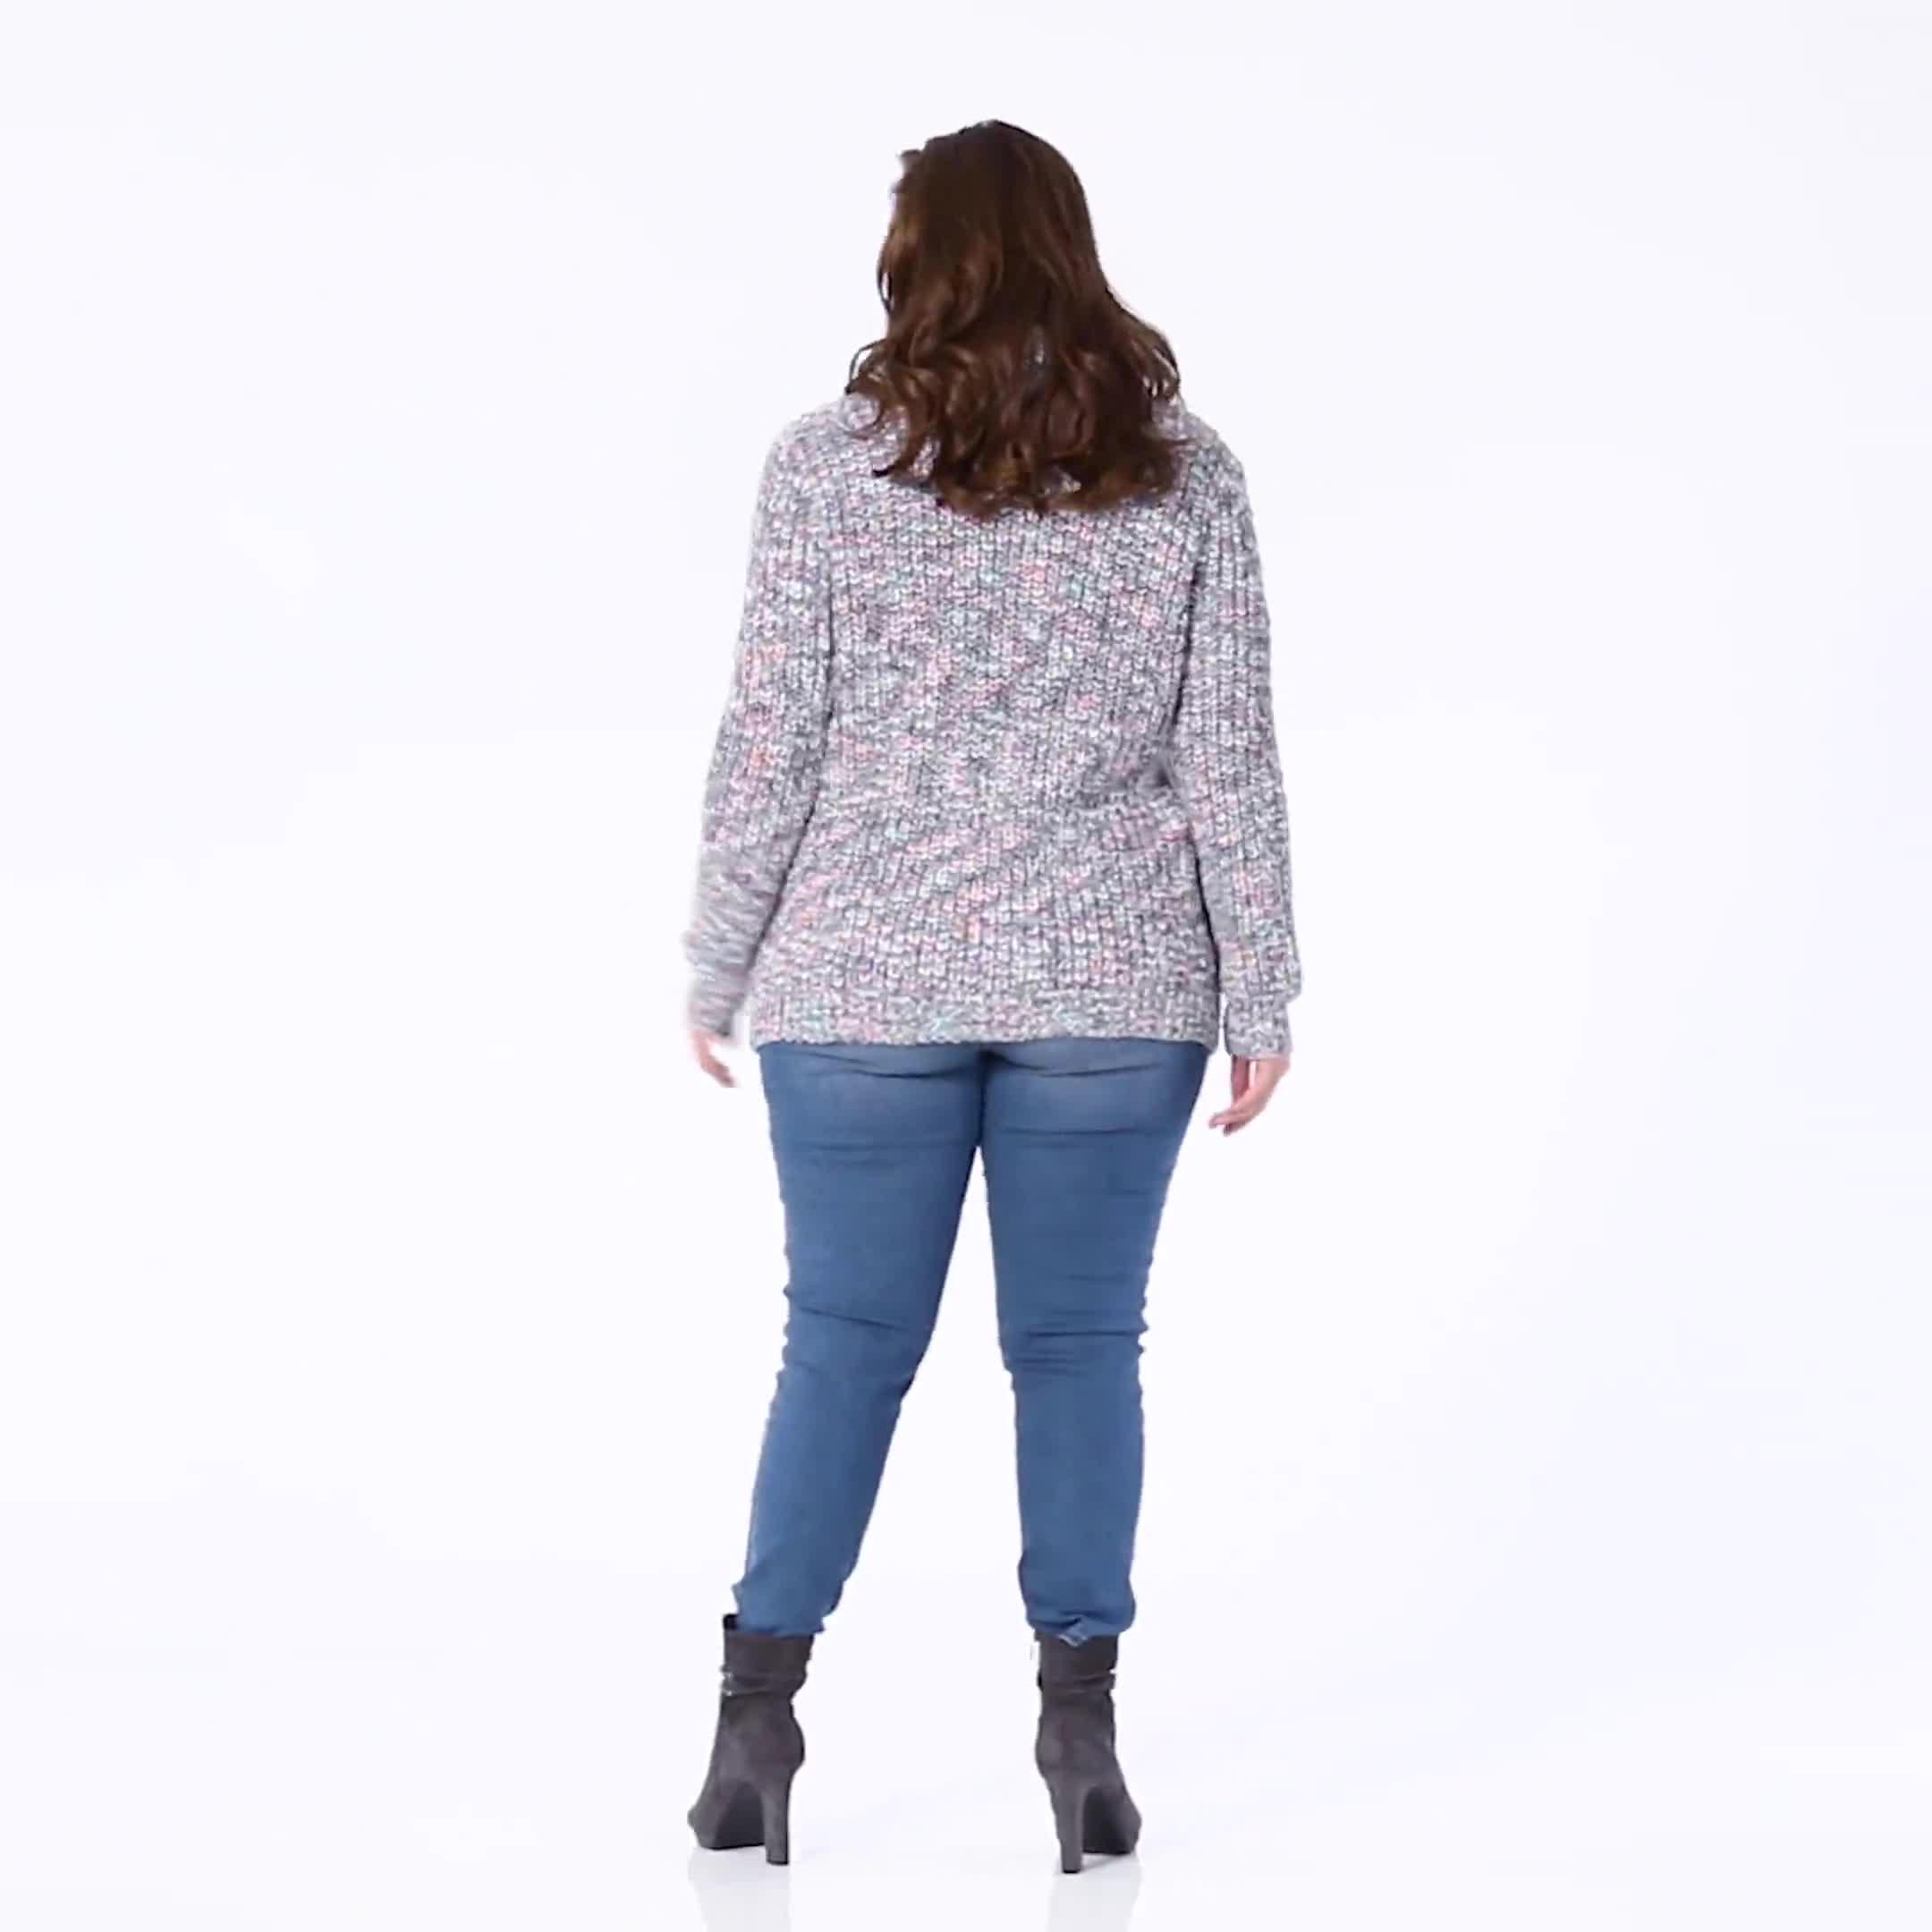 Roz & Ali Novelty Split Neck Pullover Sweater - Video